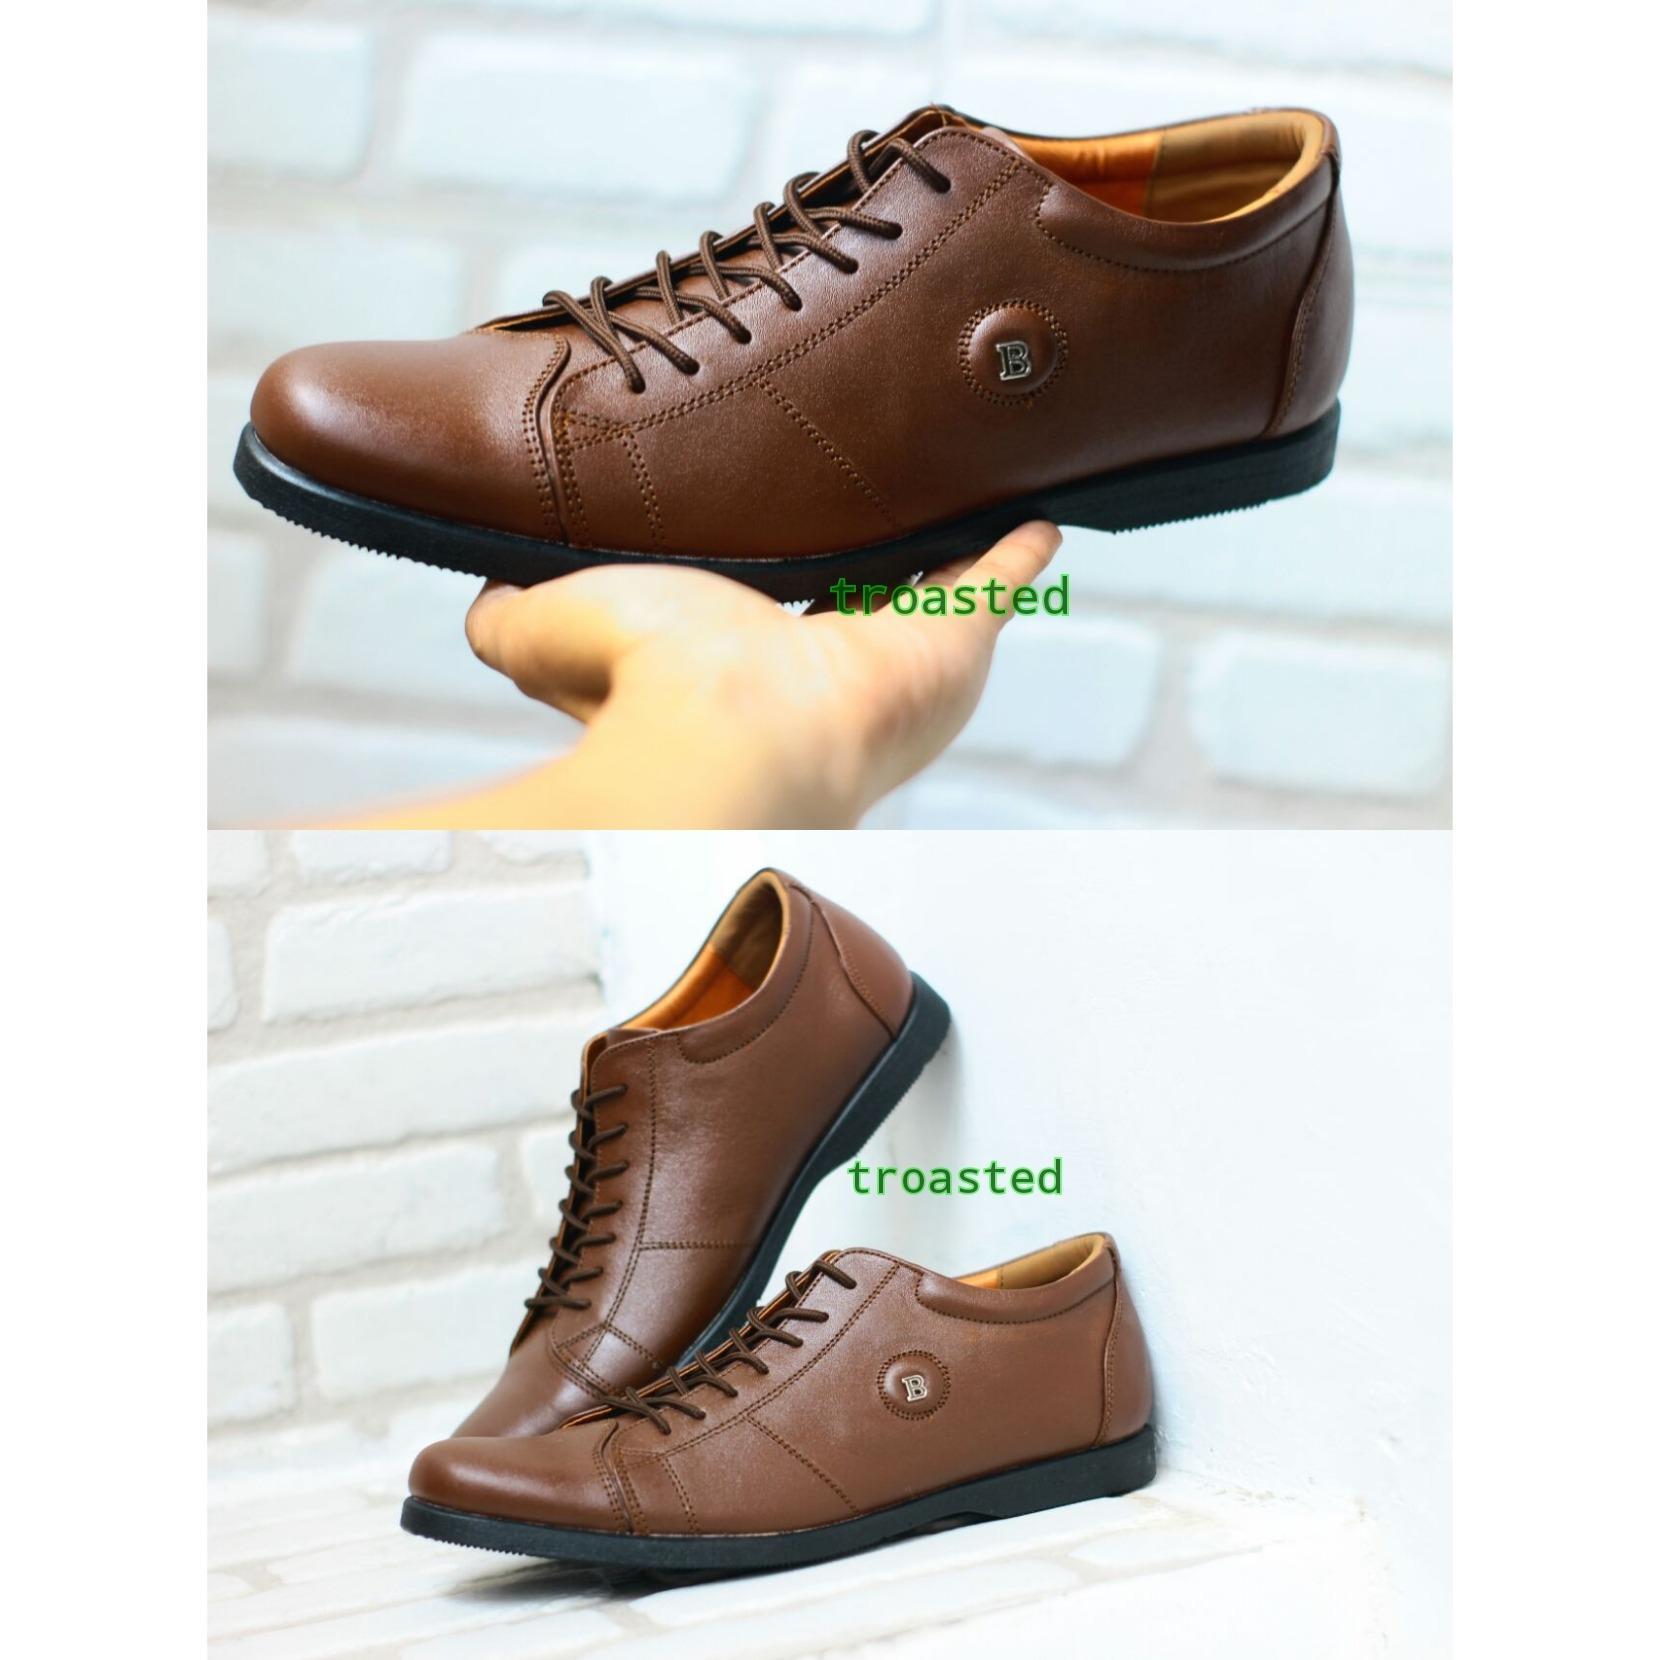 Rp 330.000. Sepatu formal pria kasual tali casual kantor bally semi formal  pantofel kickers ( lokal )IDR330000 d61c46b08d